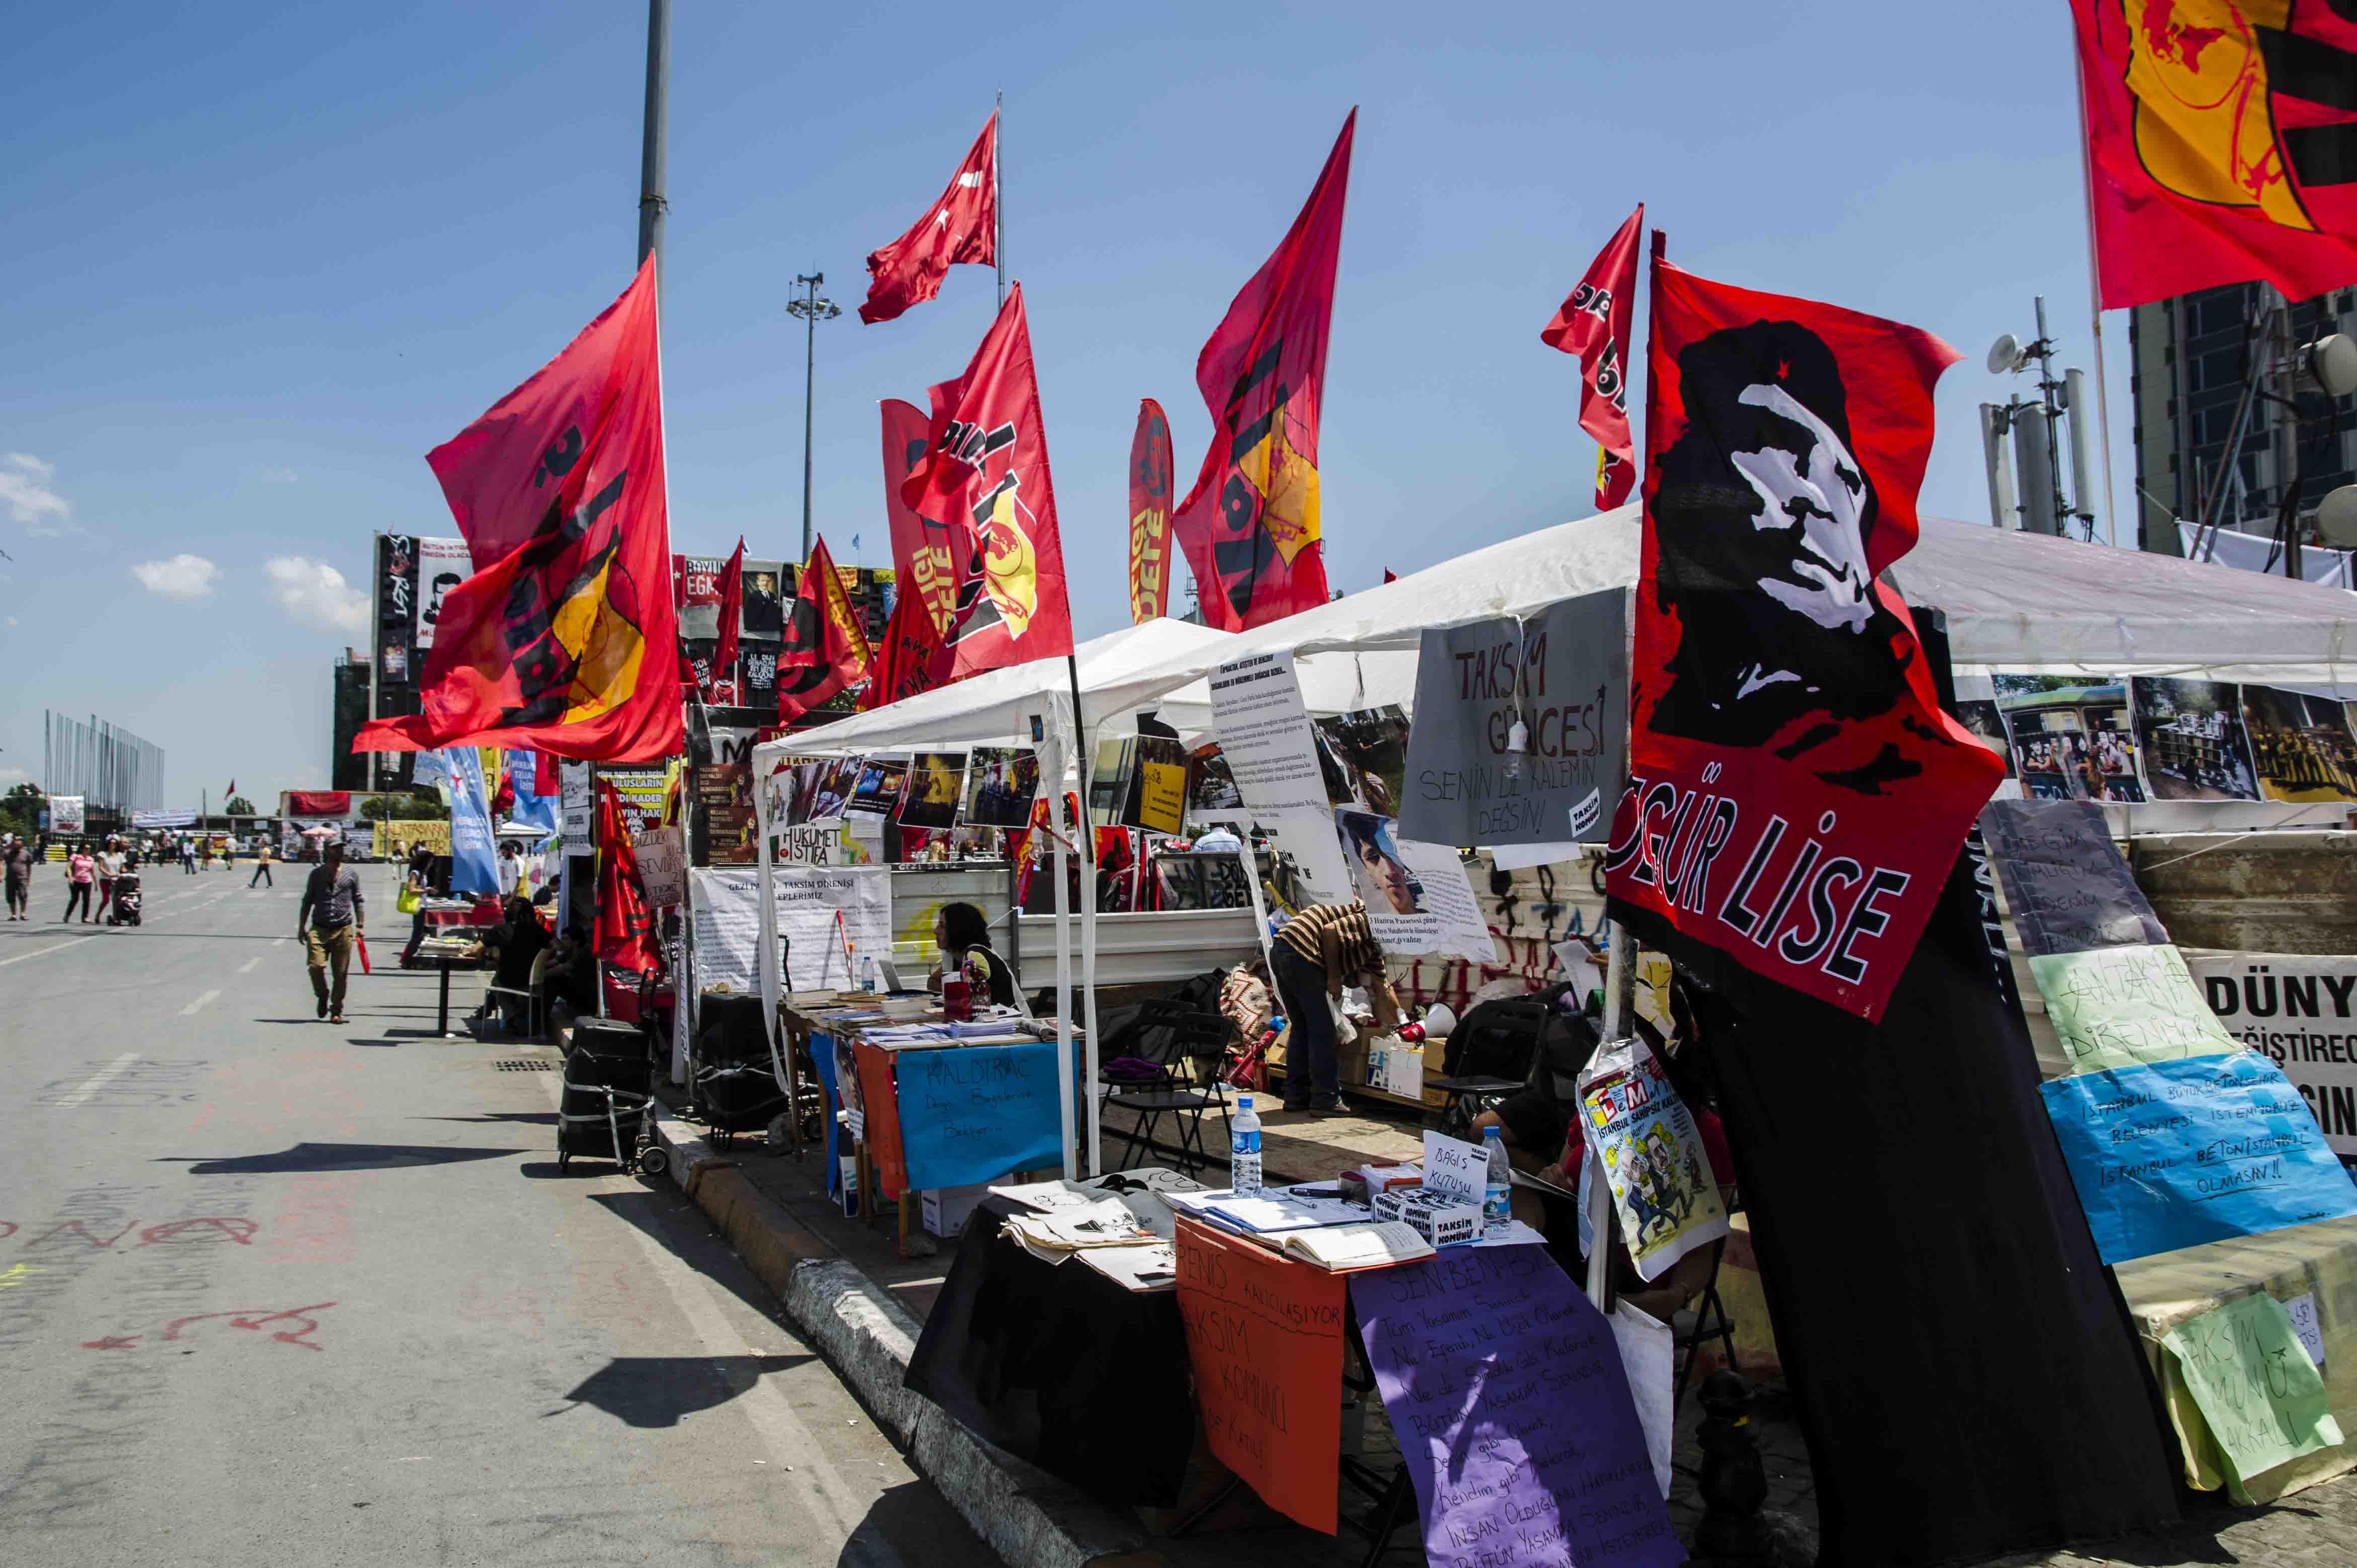 Taksim - protest time